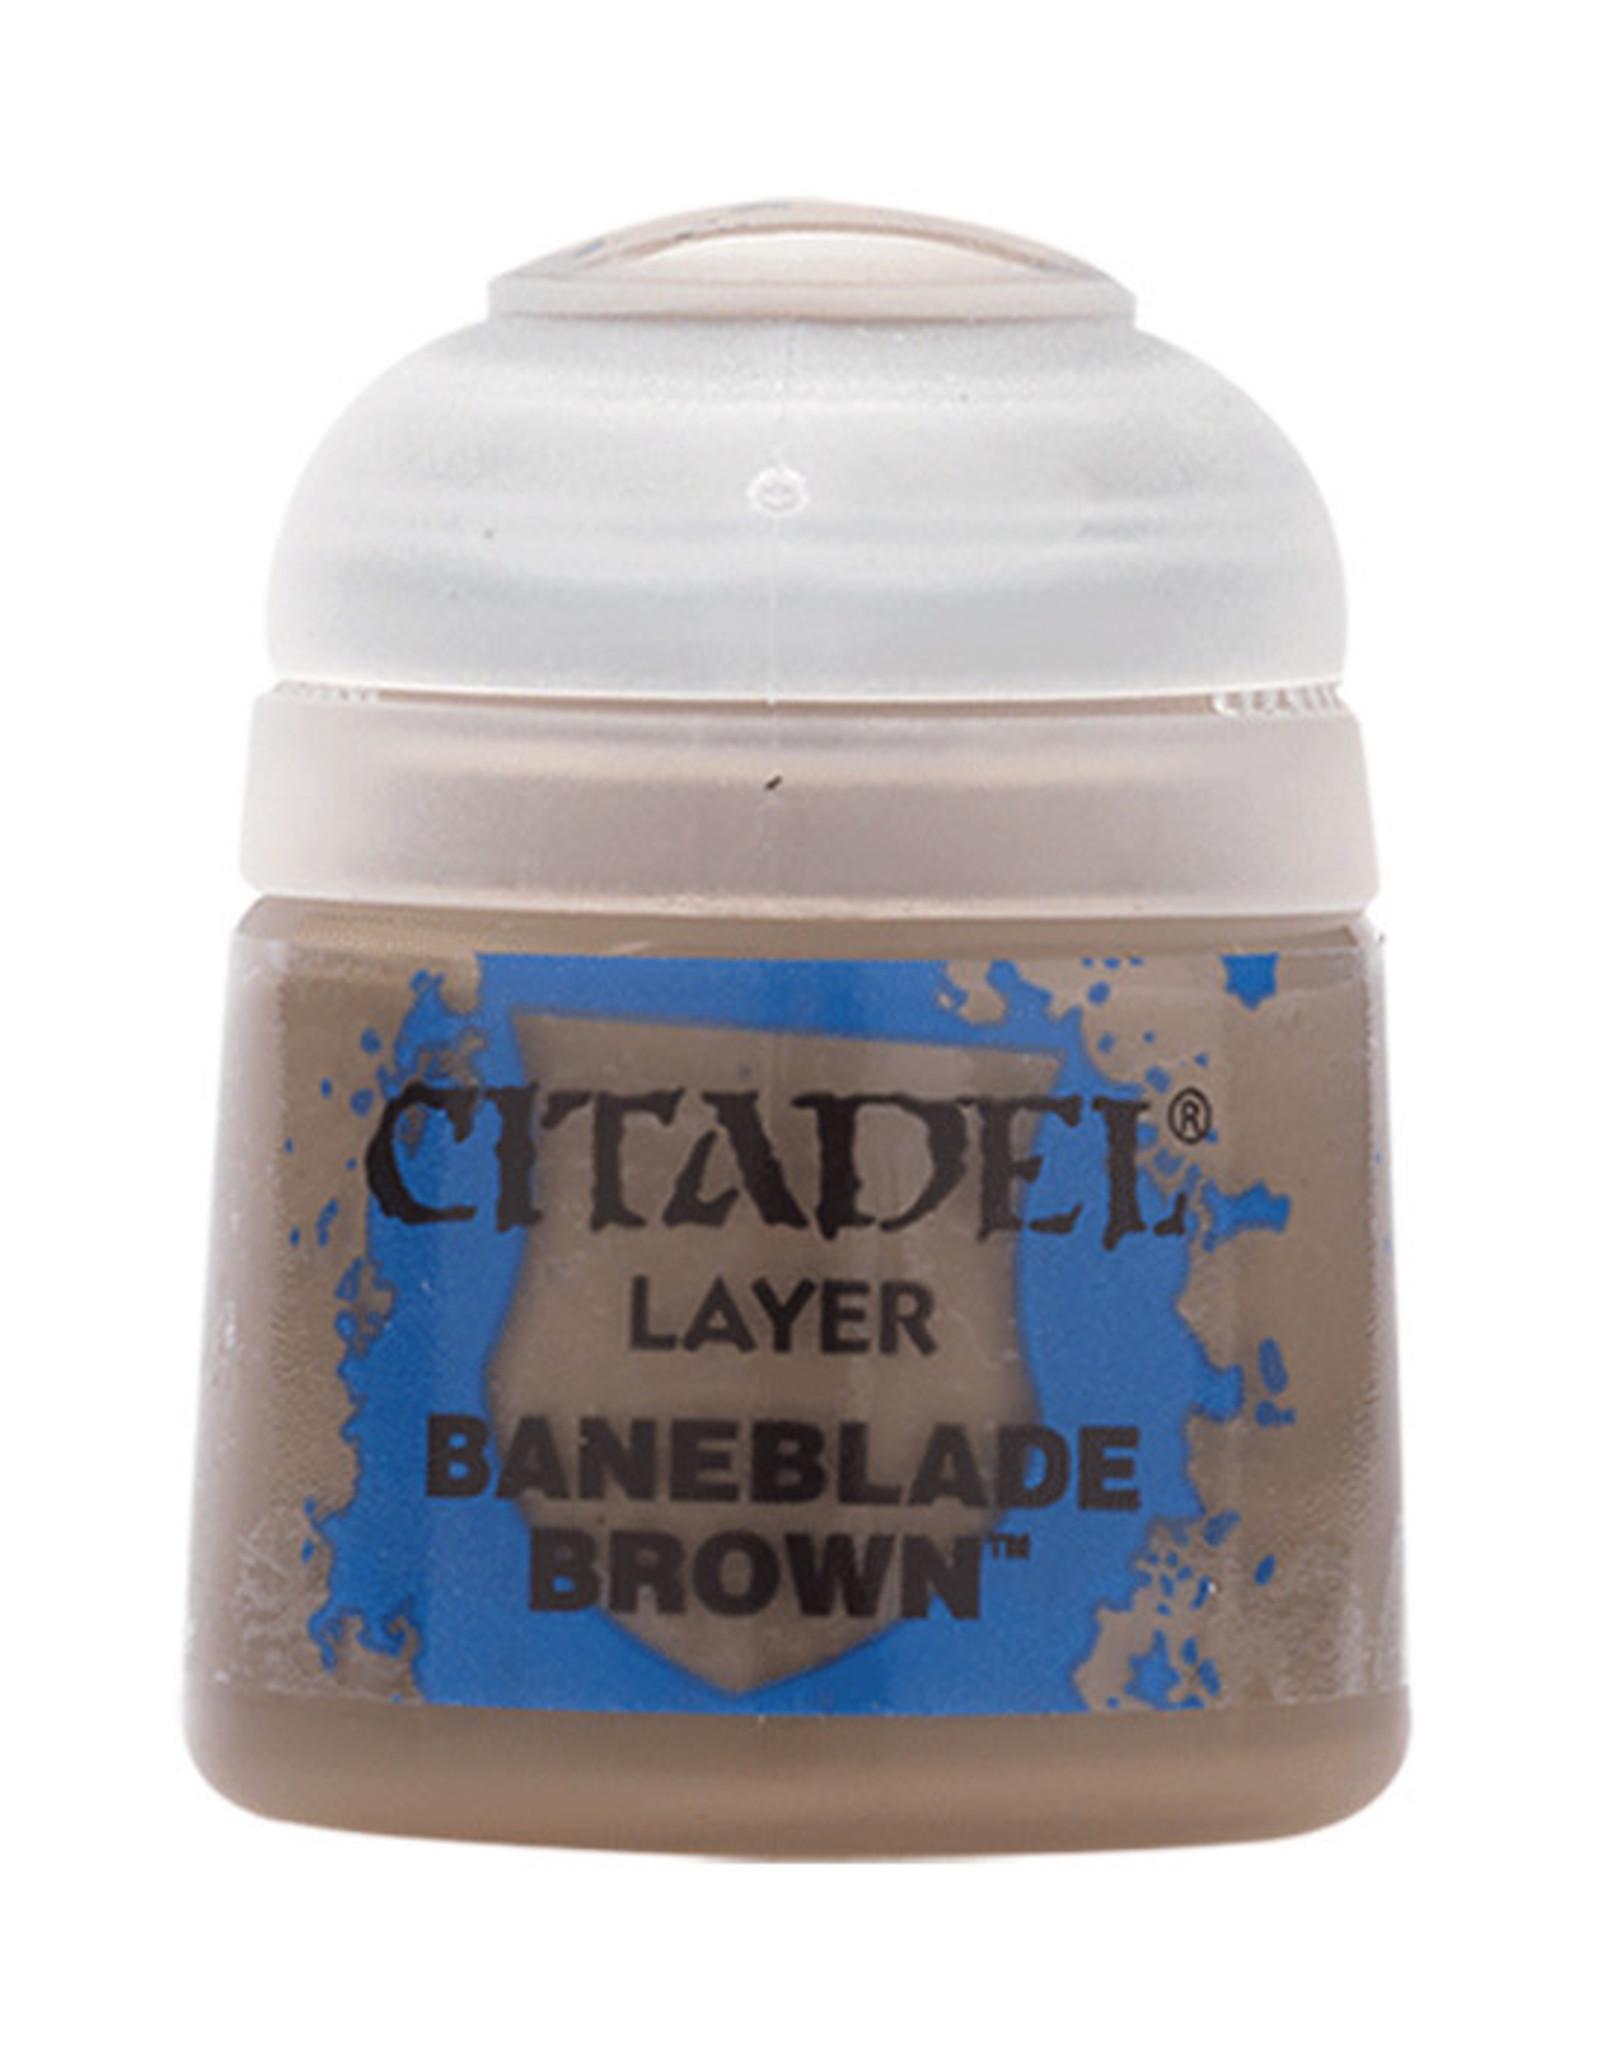 Citadel Citadel Colour: Layer - Baneblade Brown